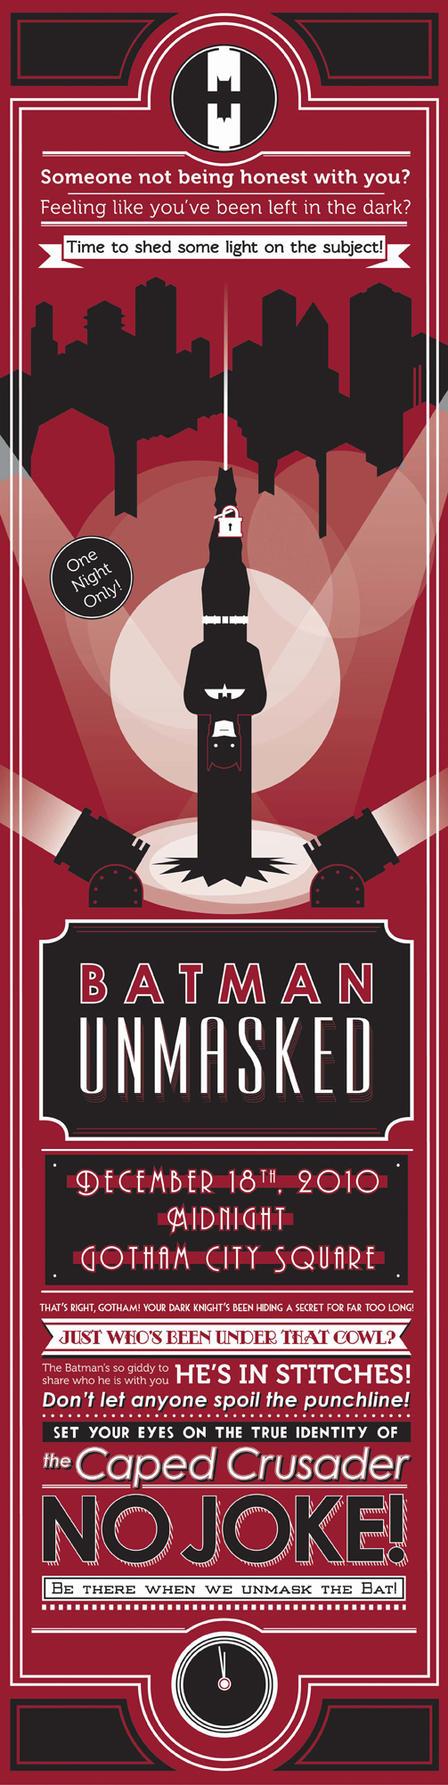 Batman Unmasked Poster by BombtasticDynamo